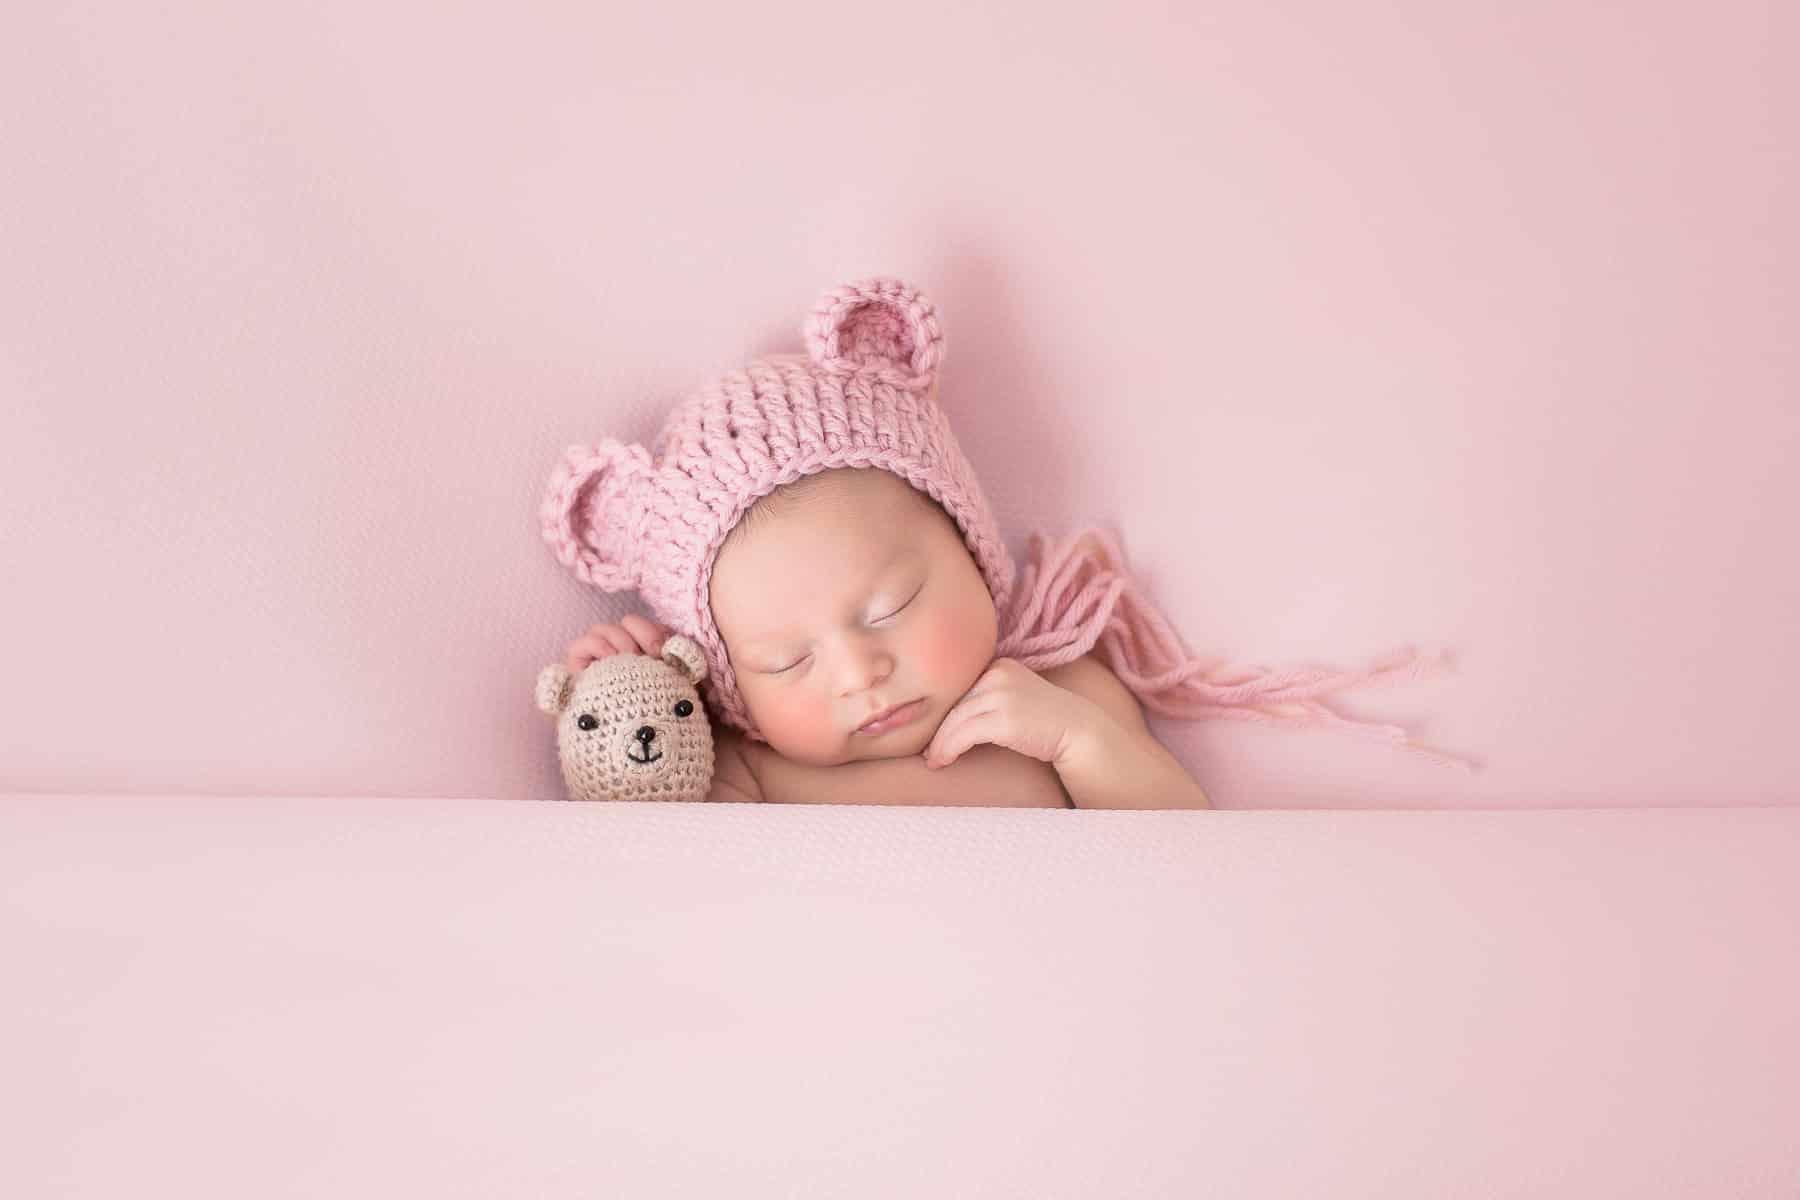 KRISTINA RECHE Petit Monde WORKSHOP FOTOGRAFOA NEWBORN 30 - Maternity